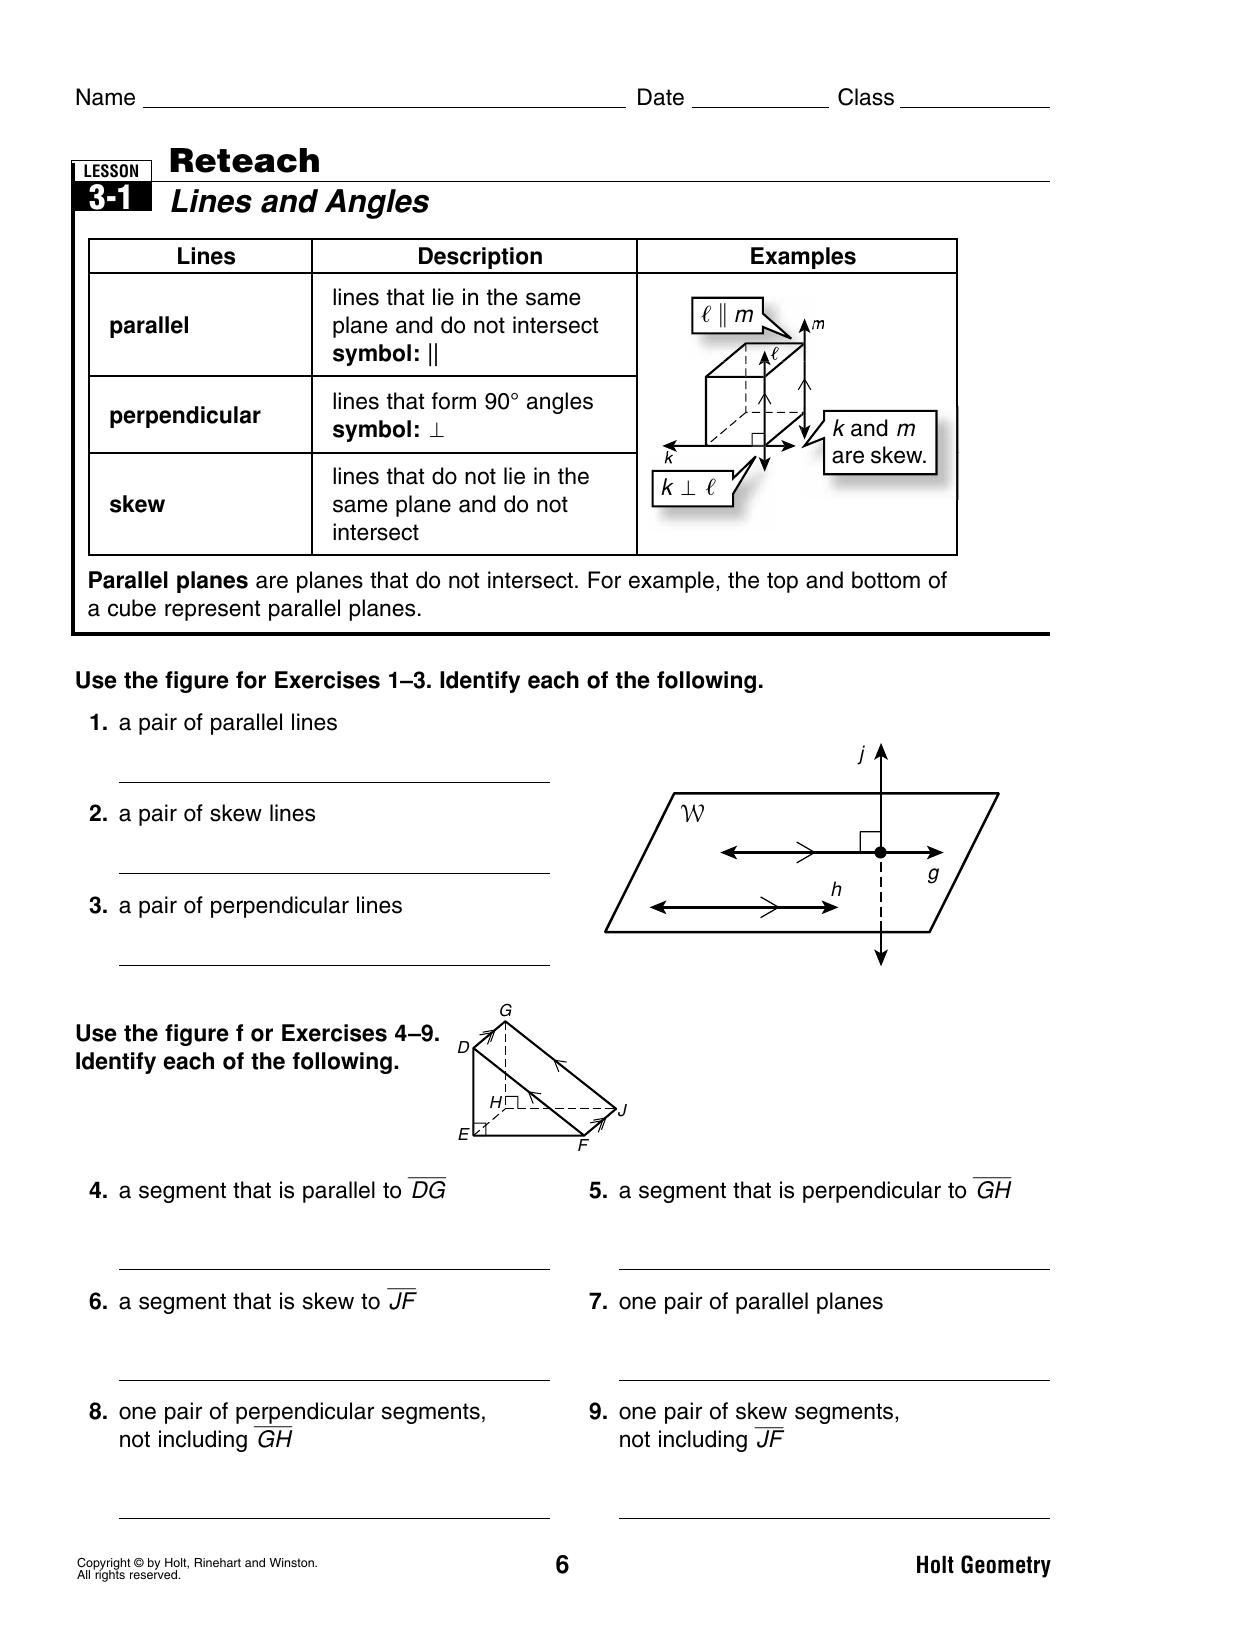 Bestseller Holt Geometry Worksheet Answers Reteach Lesson